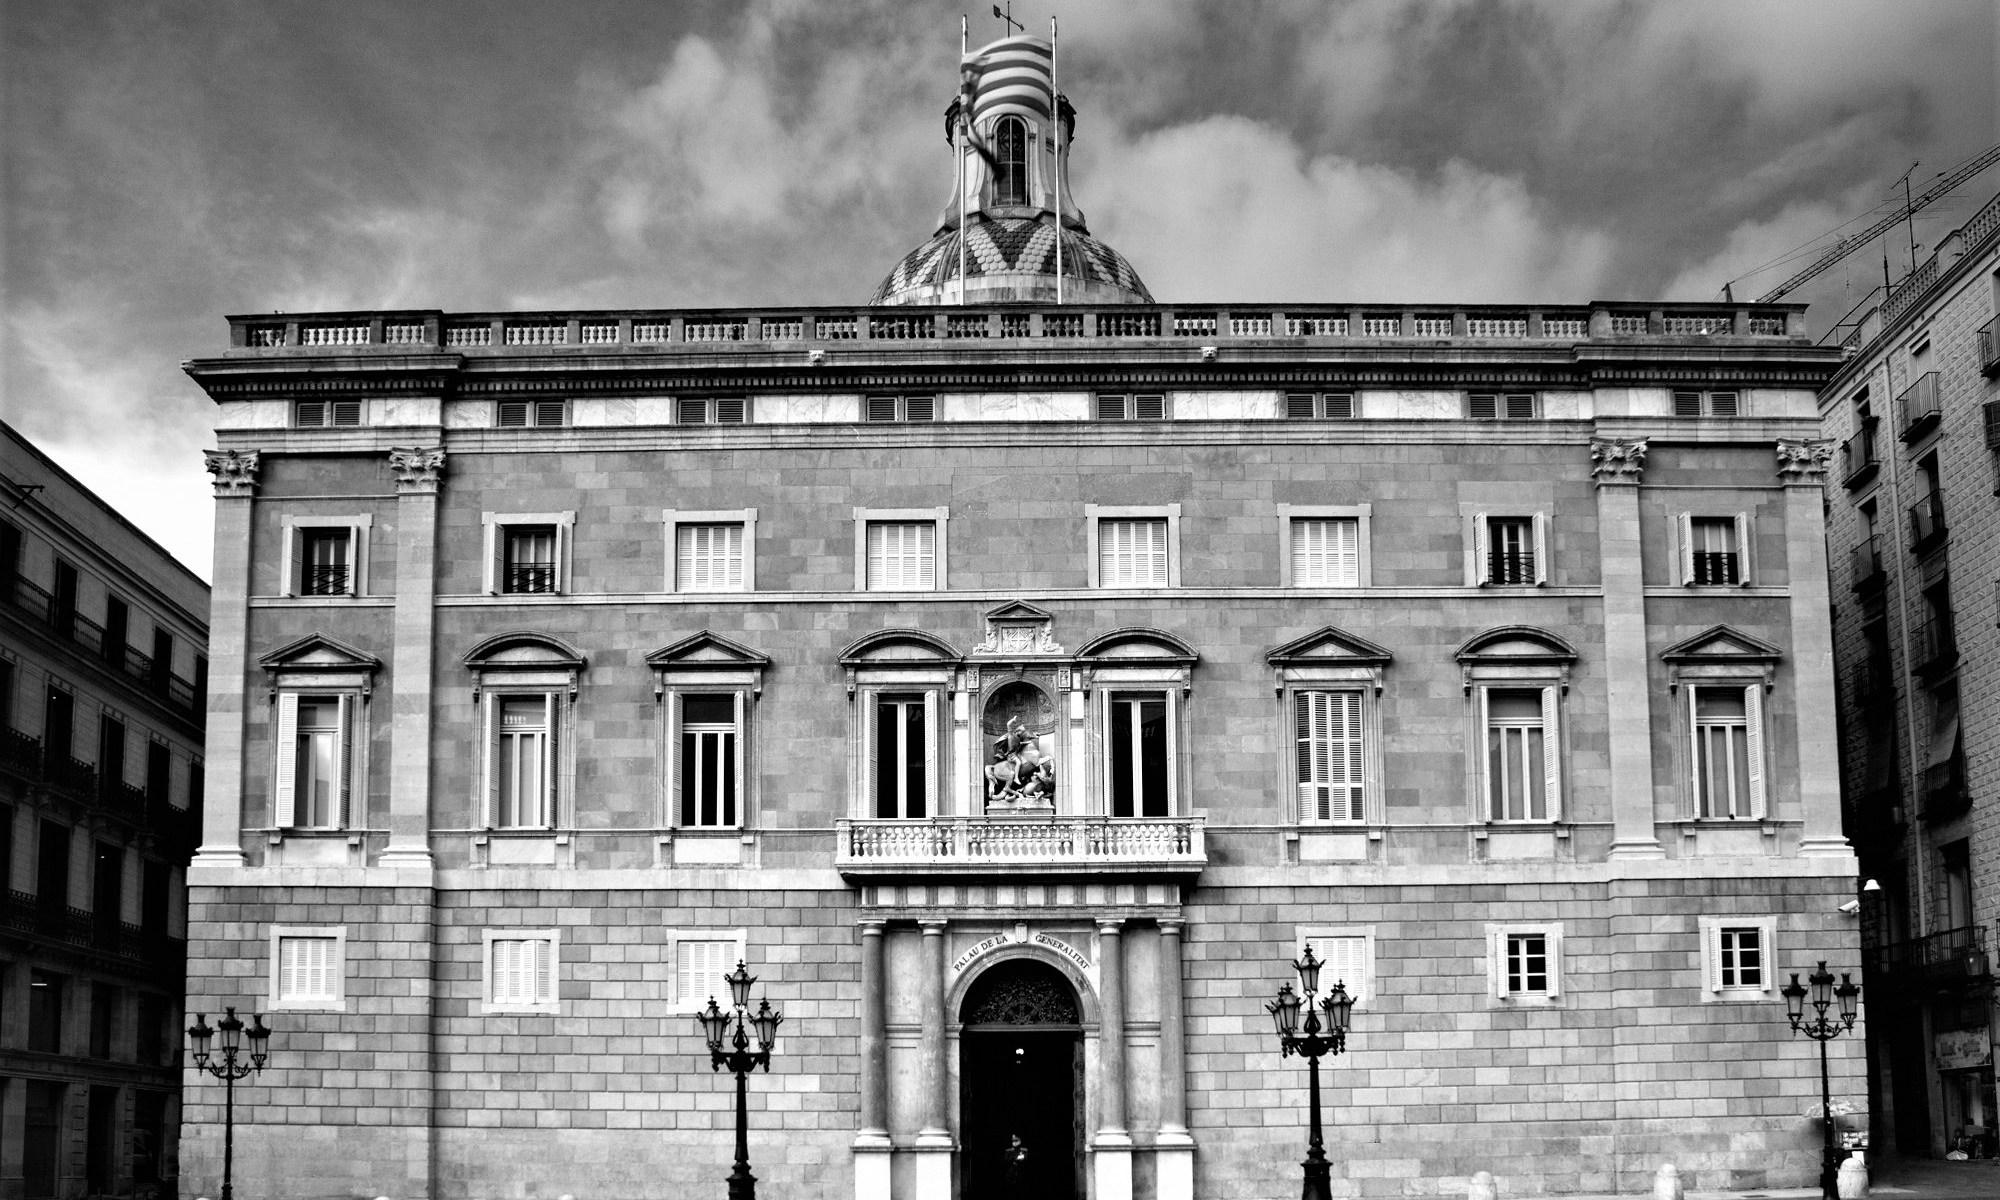 nous impostos propis Generalitat